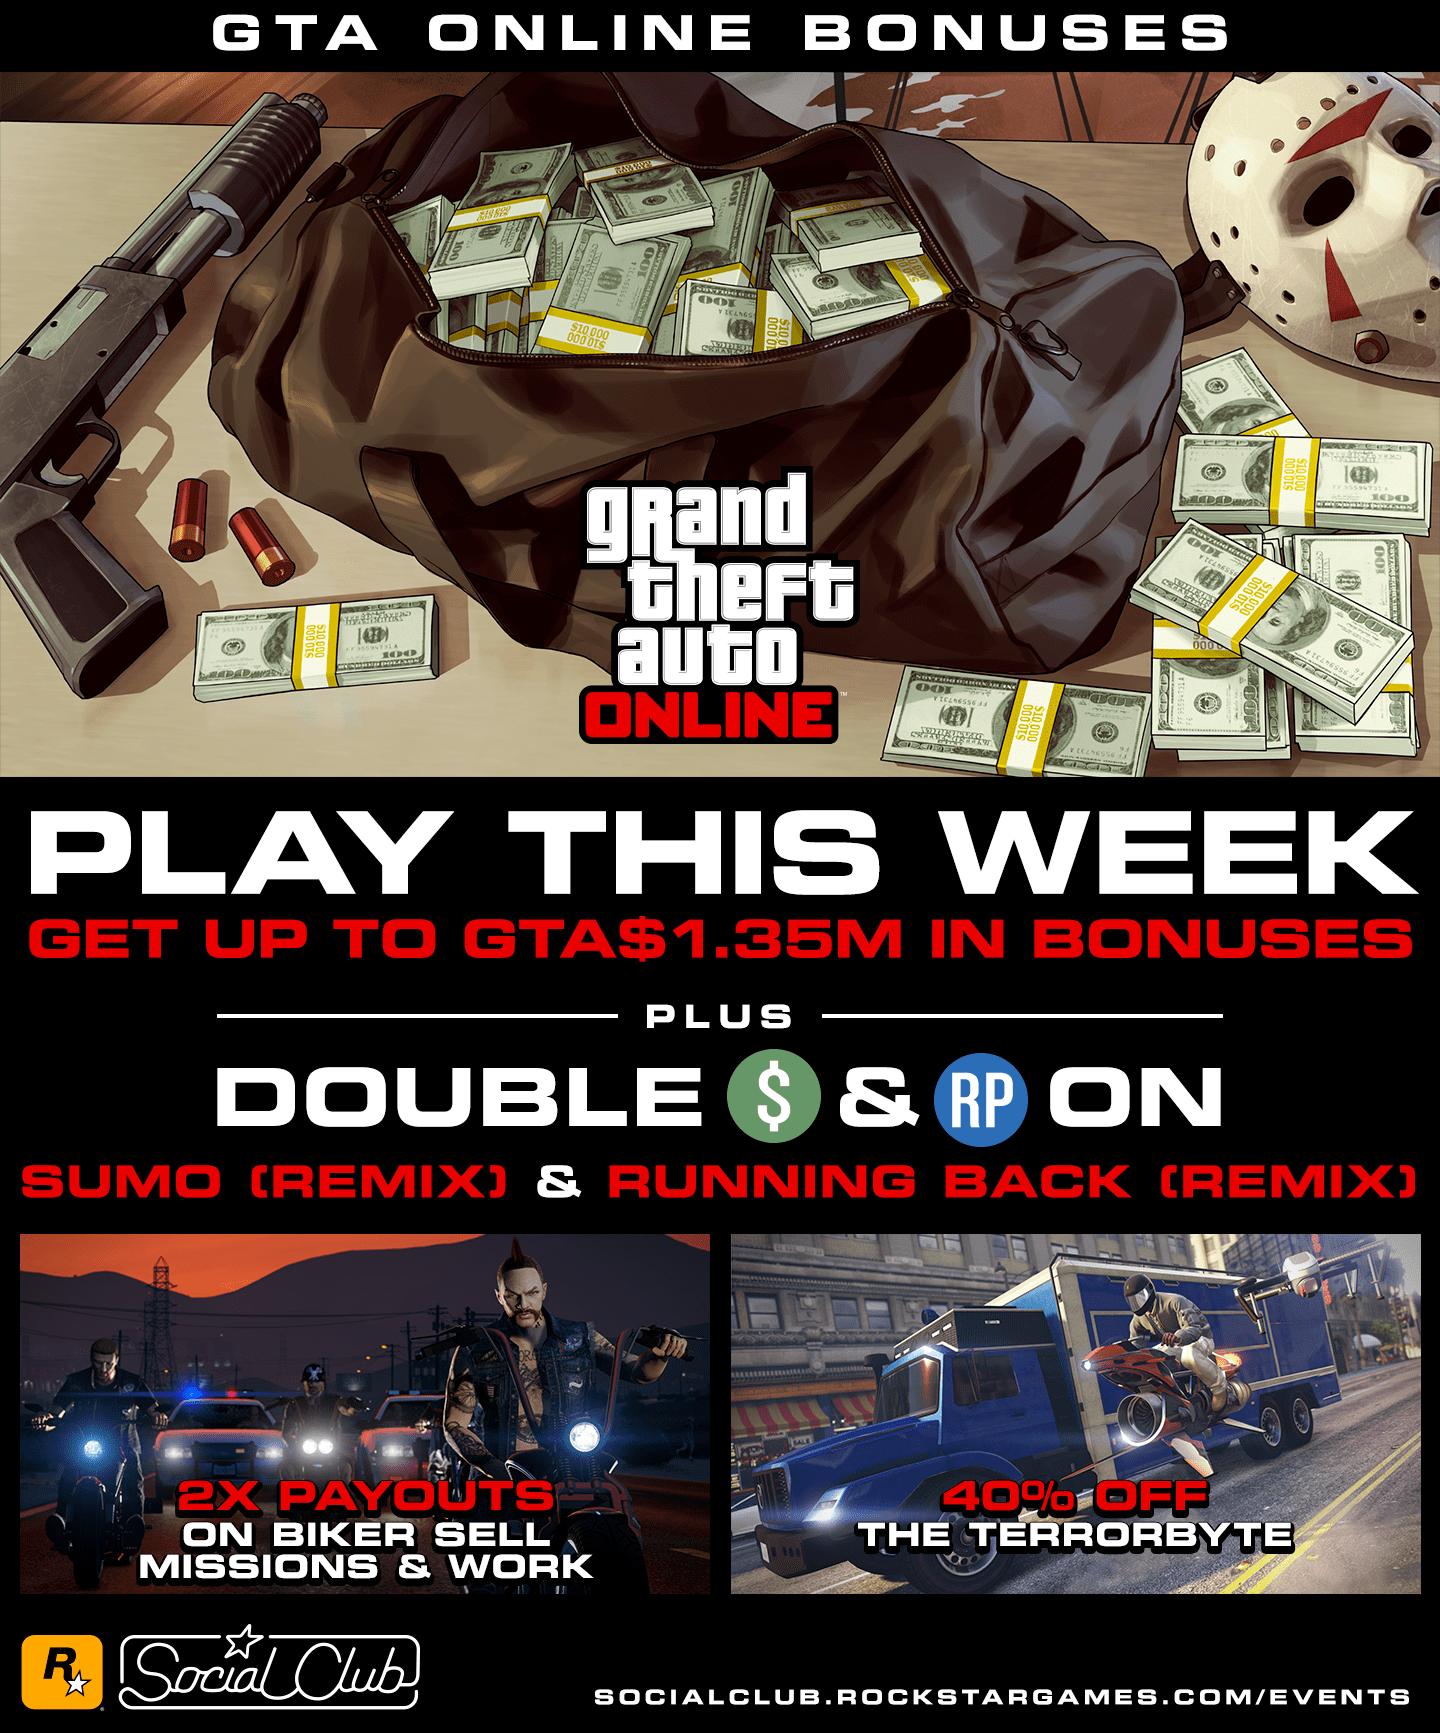 Dewbauchee Vagner Gta 5 : dewbauchee, vagner, GTA10.35M, Bonuses, Rockstar, Games